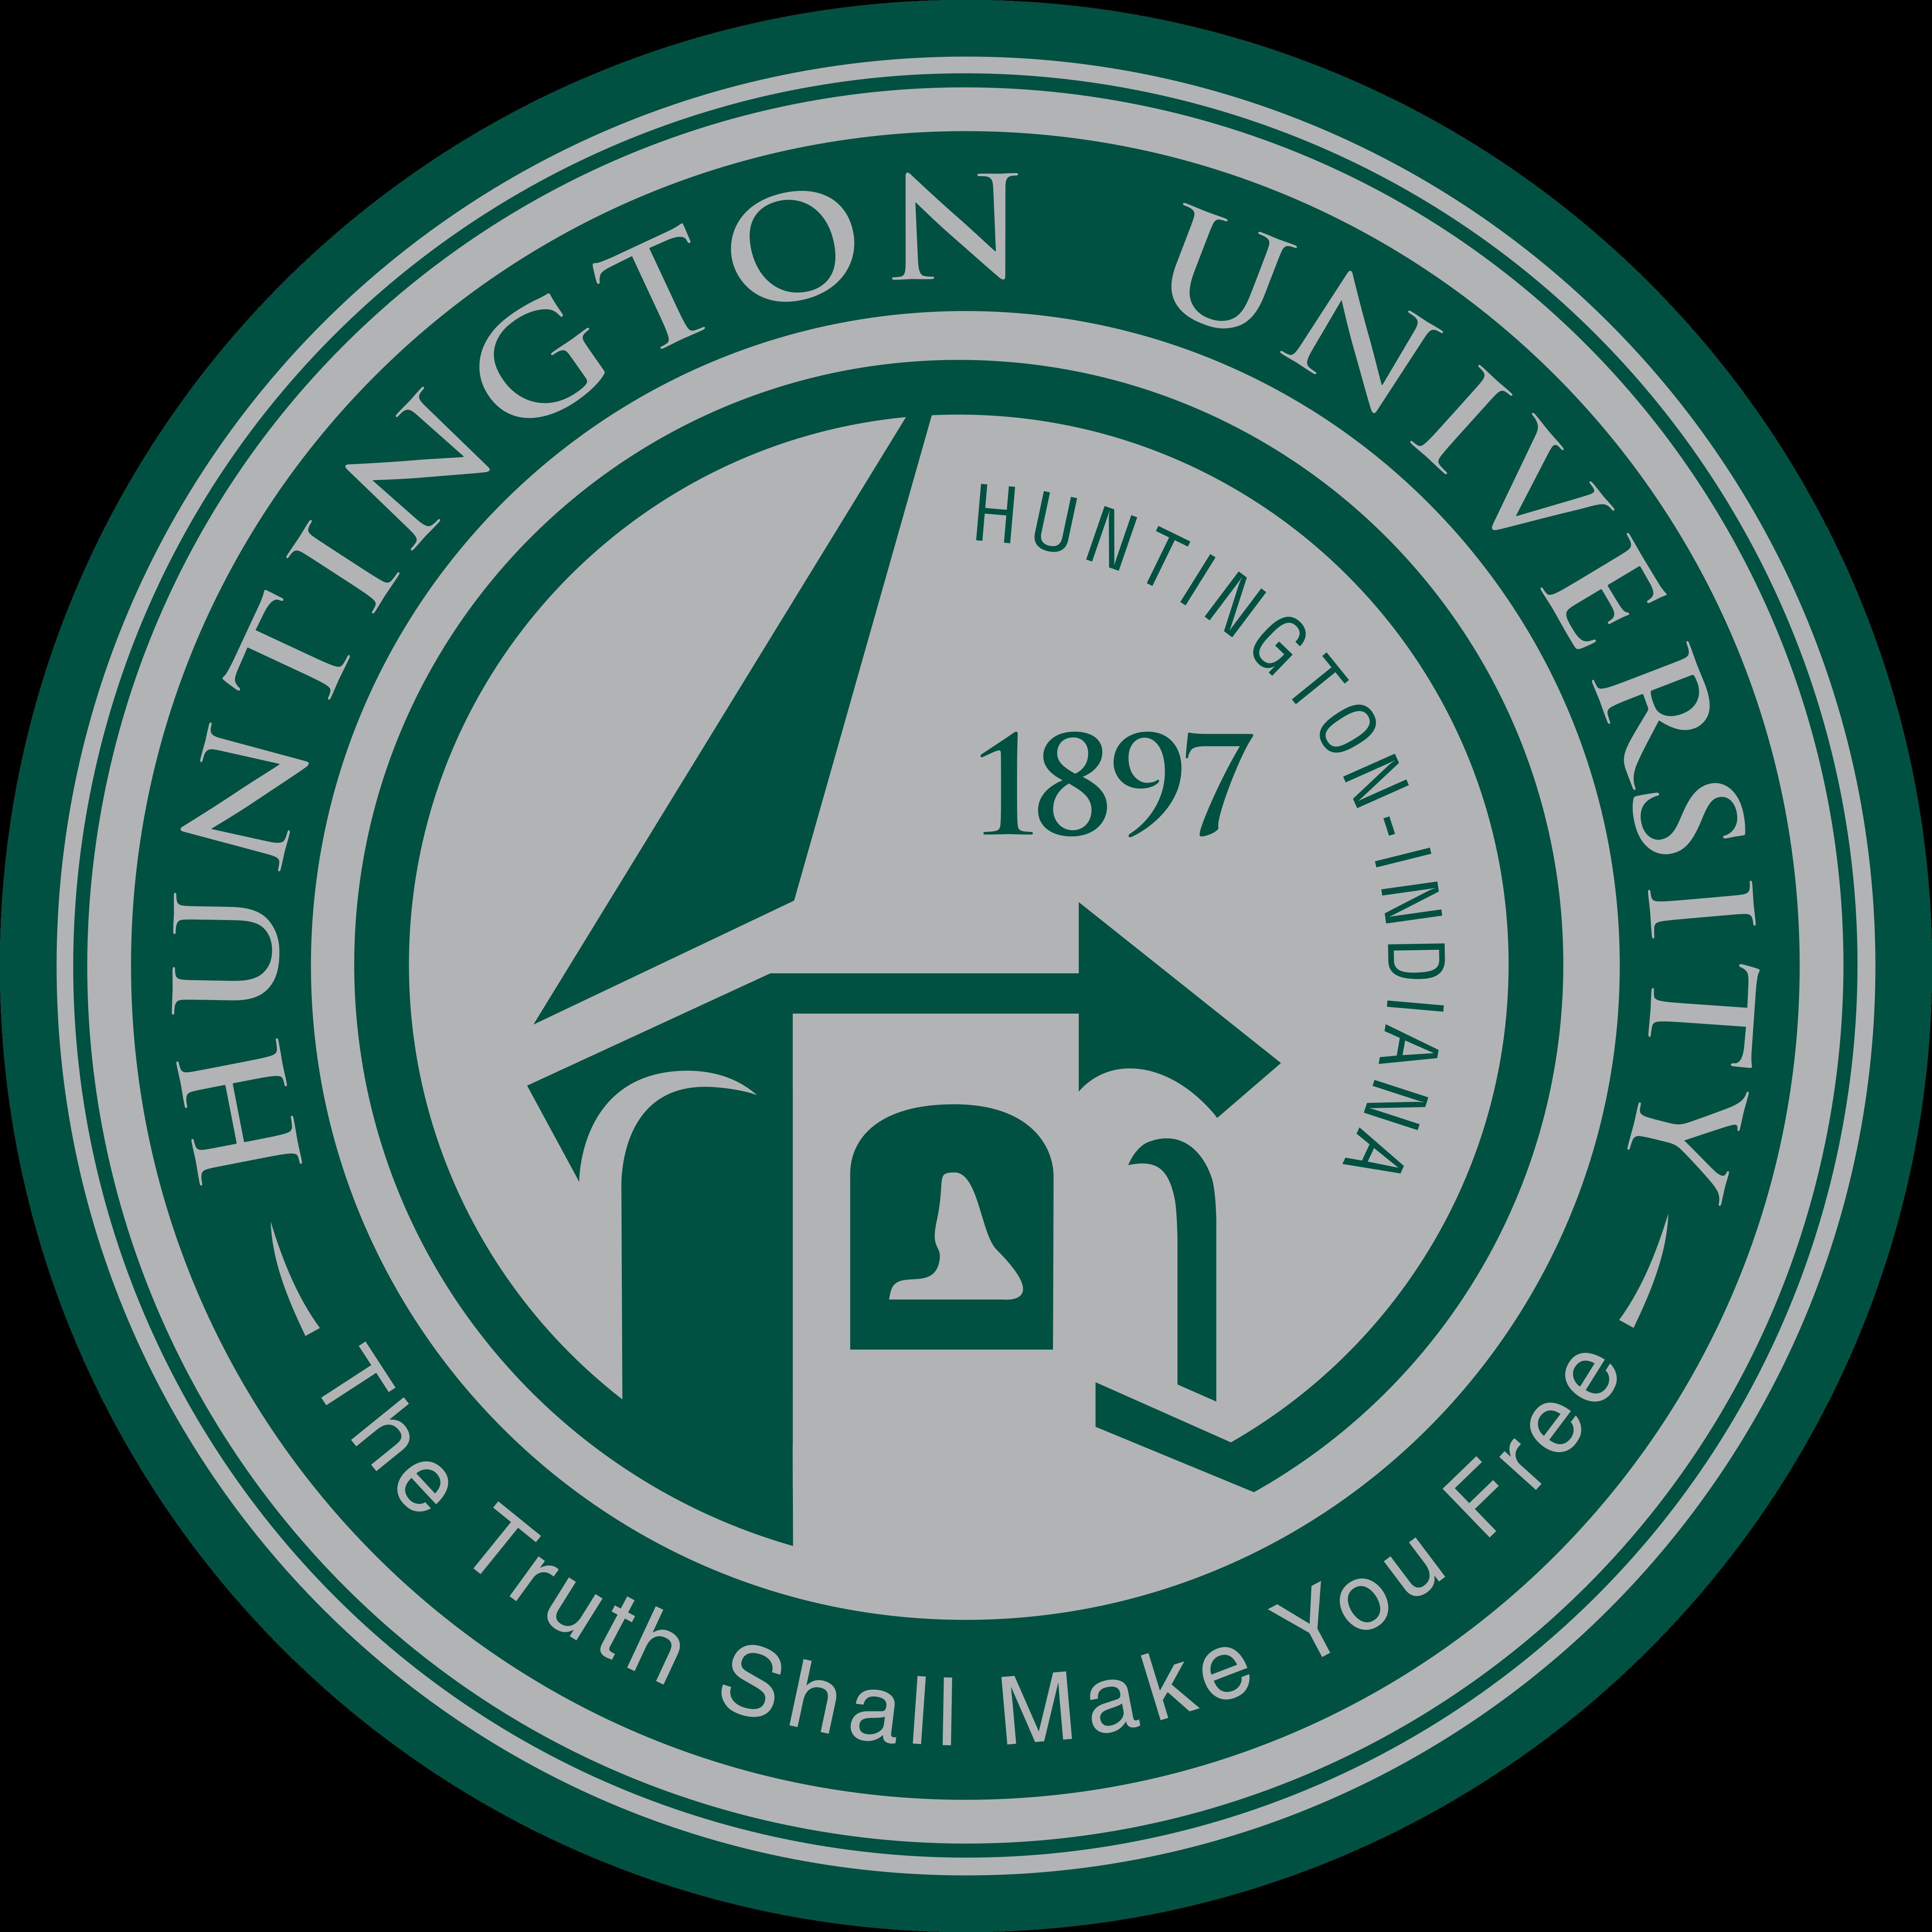 Huntington University.